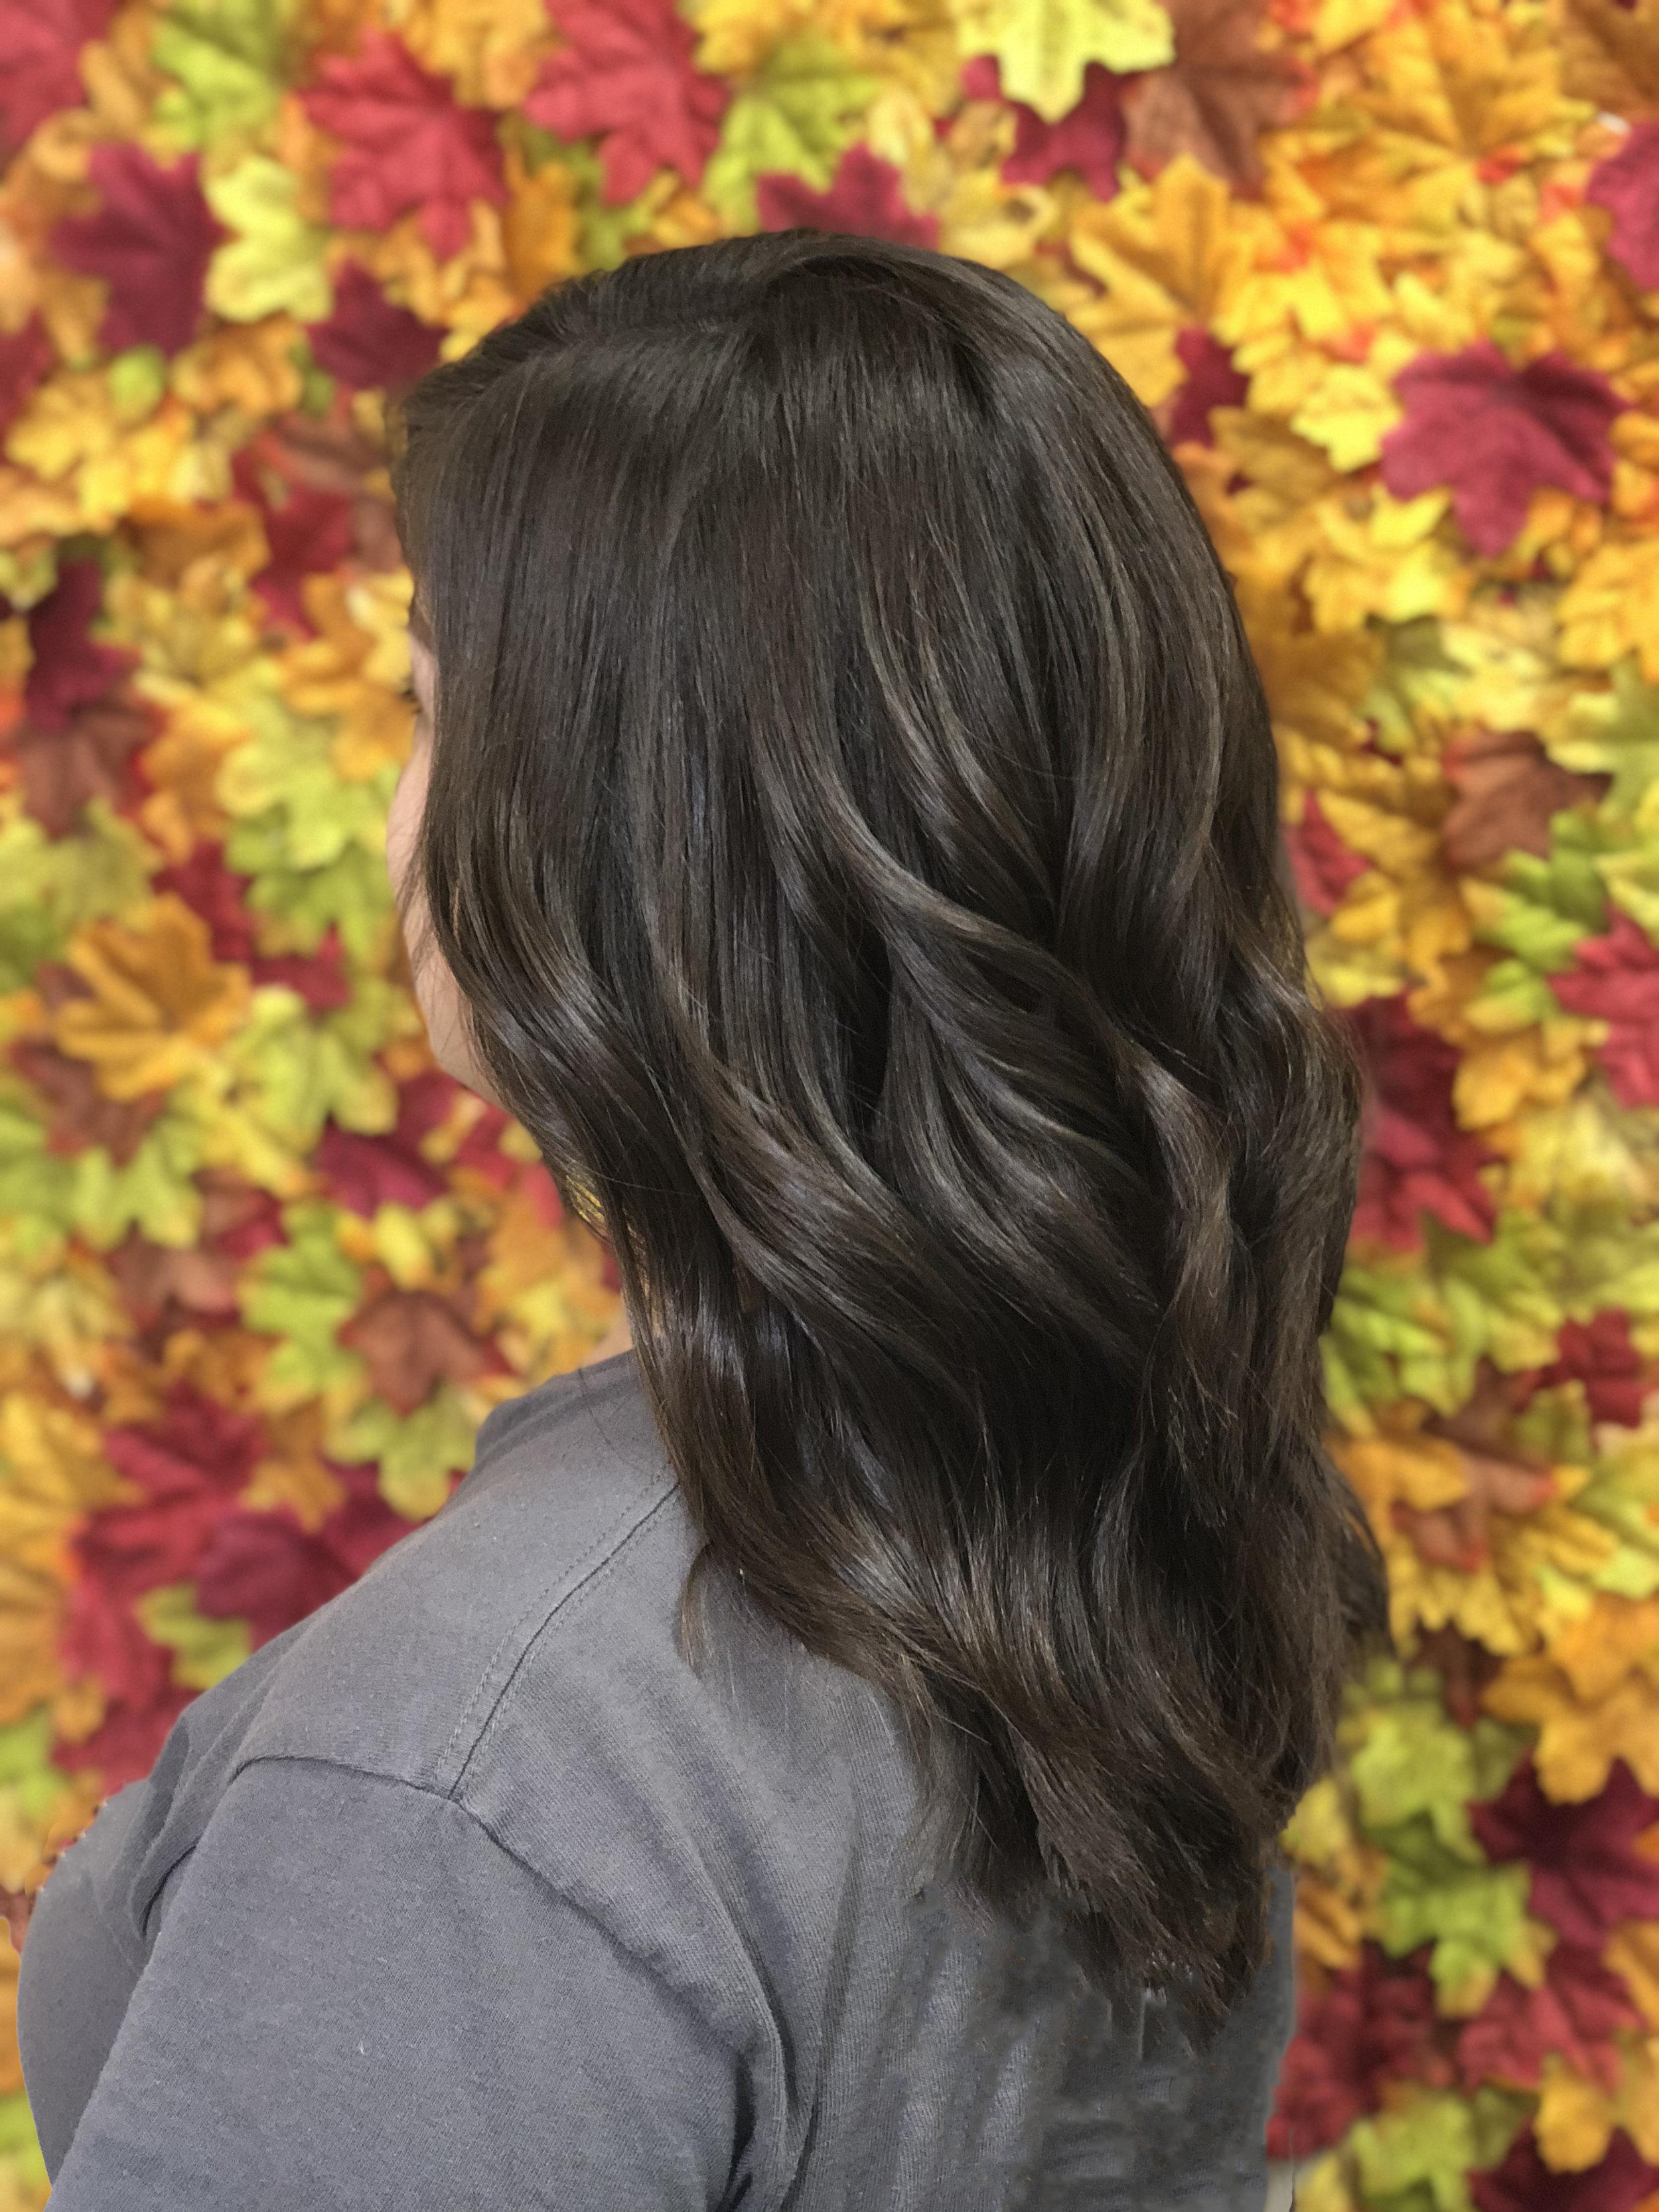 #Balayage #Hair #Highlights #Haircut #Stylist #Salon #Hairsalon #Blowout #Hairdresser #Colorist #Hairstylist #Haircolor #Retouch #Keratin